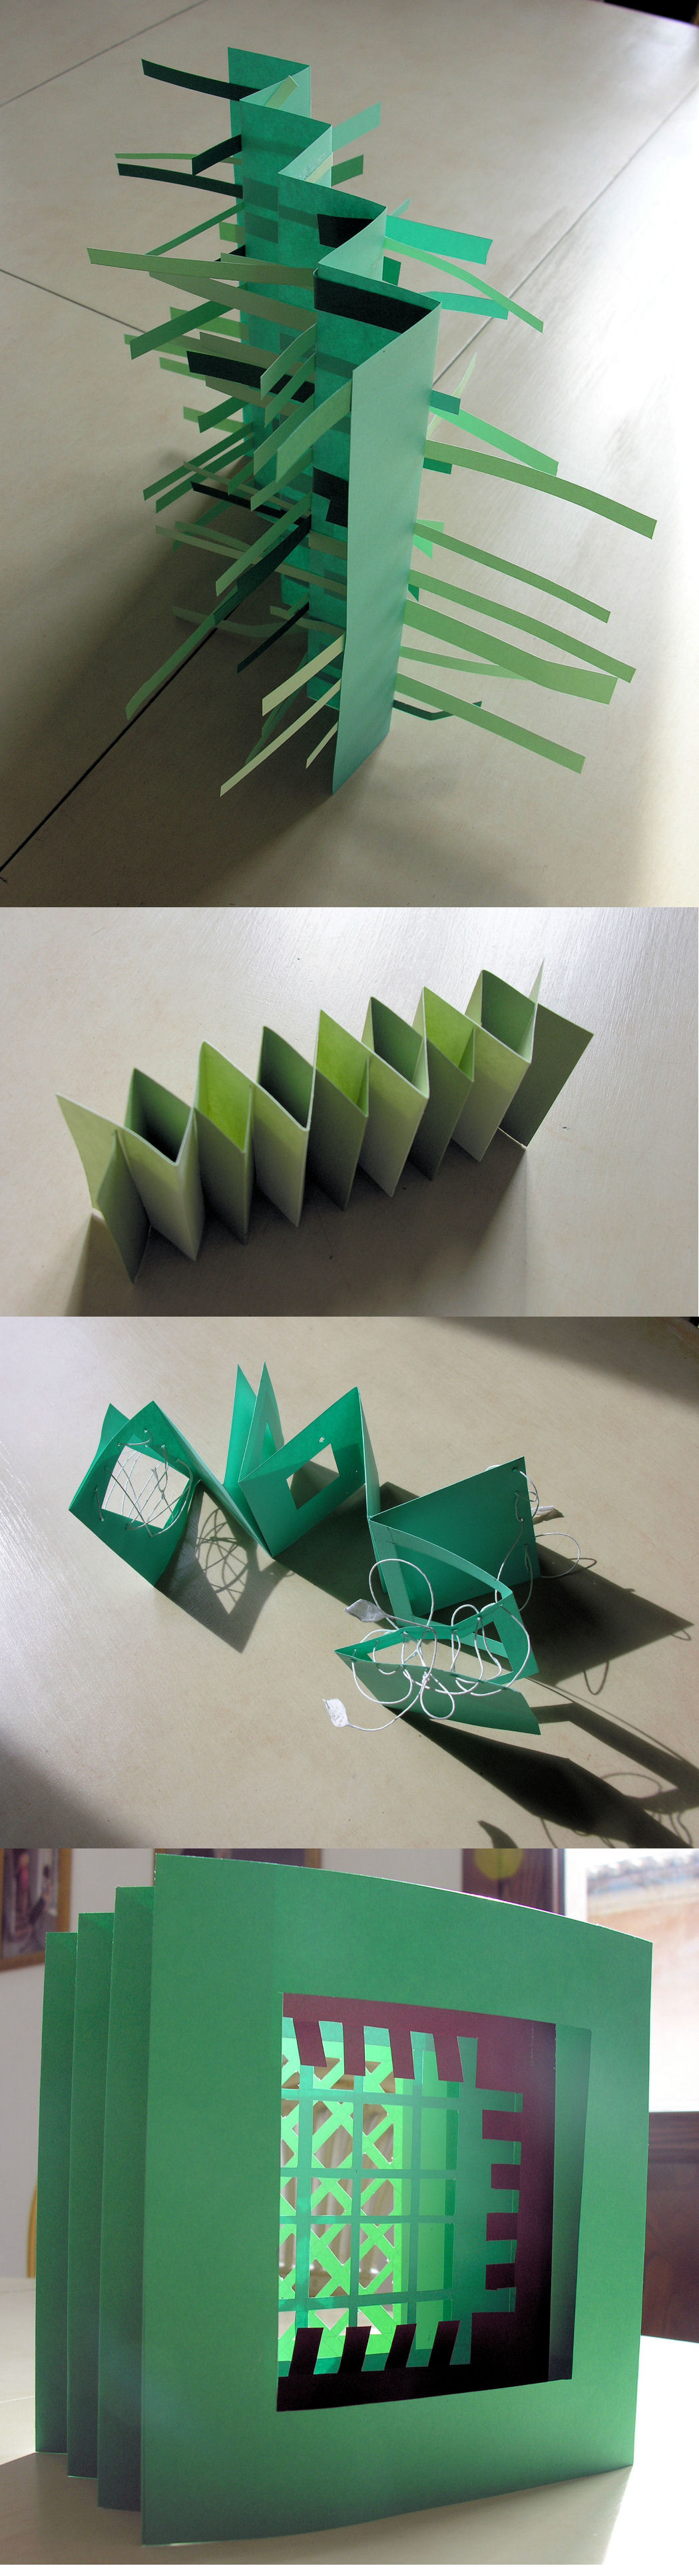 Paper booklet samples